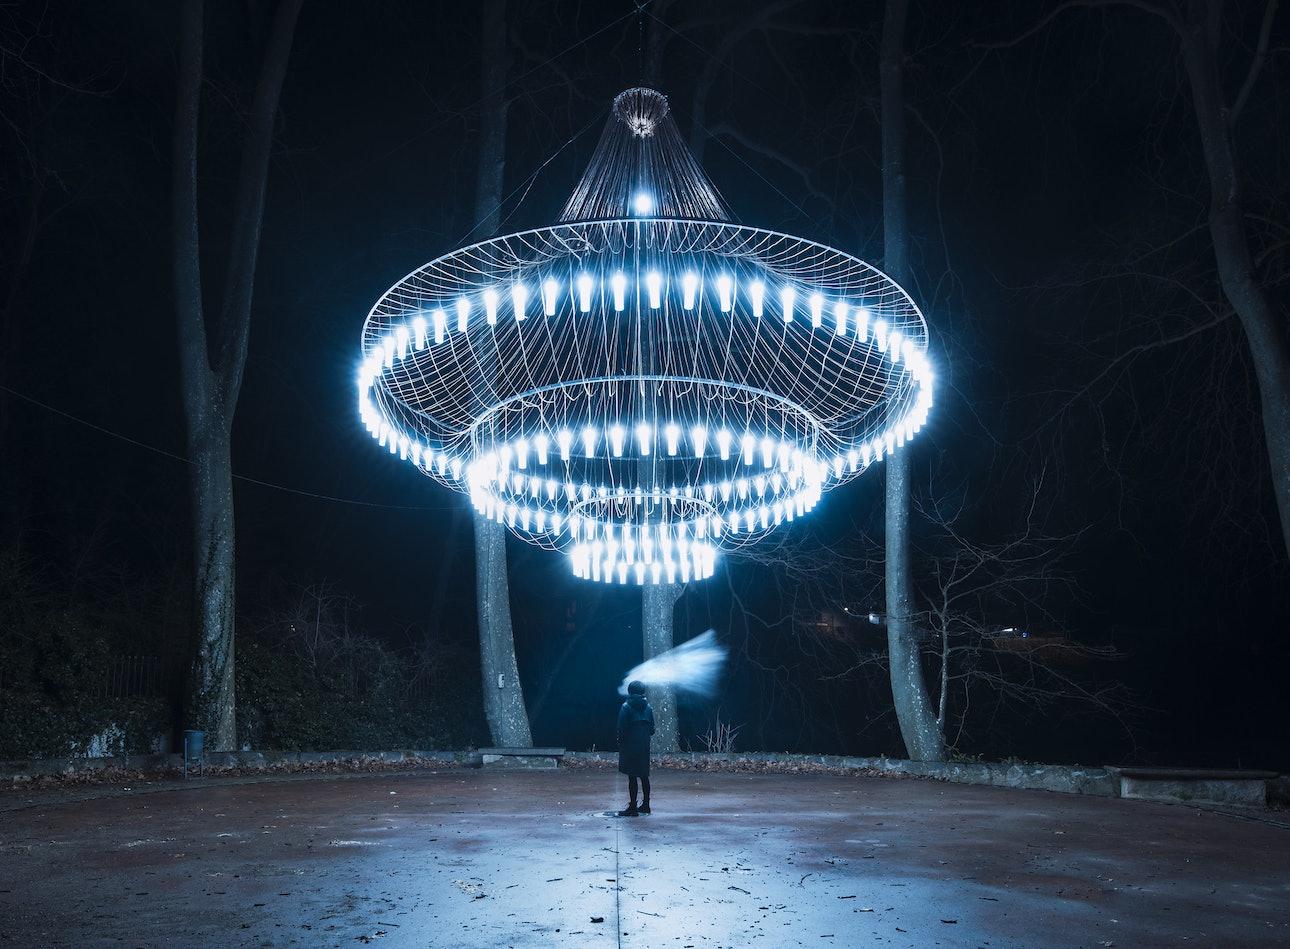 Инсталляция в городе Олот, Испания, фотограф Сяо Янг, Xiao Yang Eternal monuments in the dark